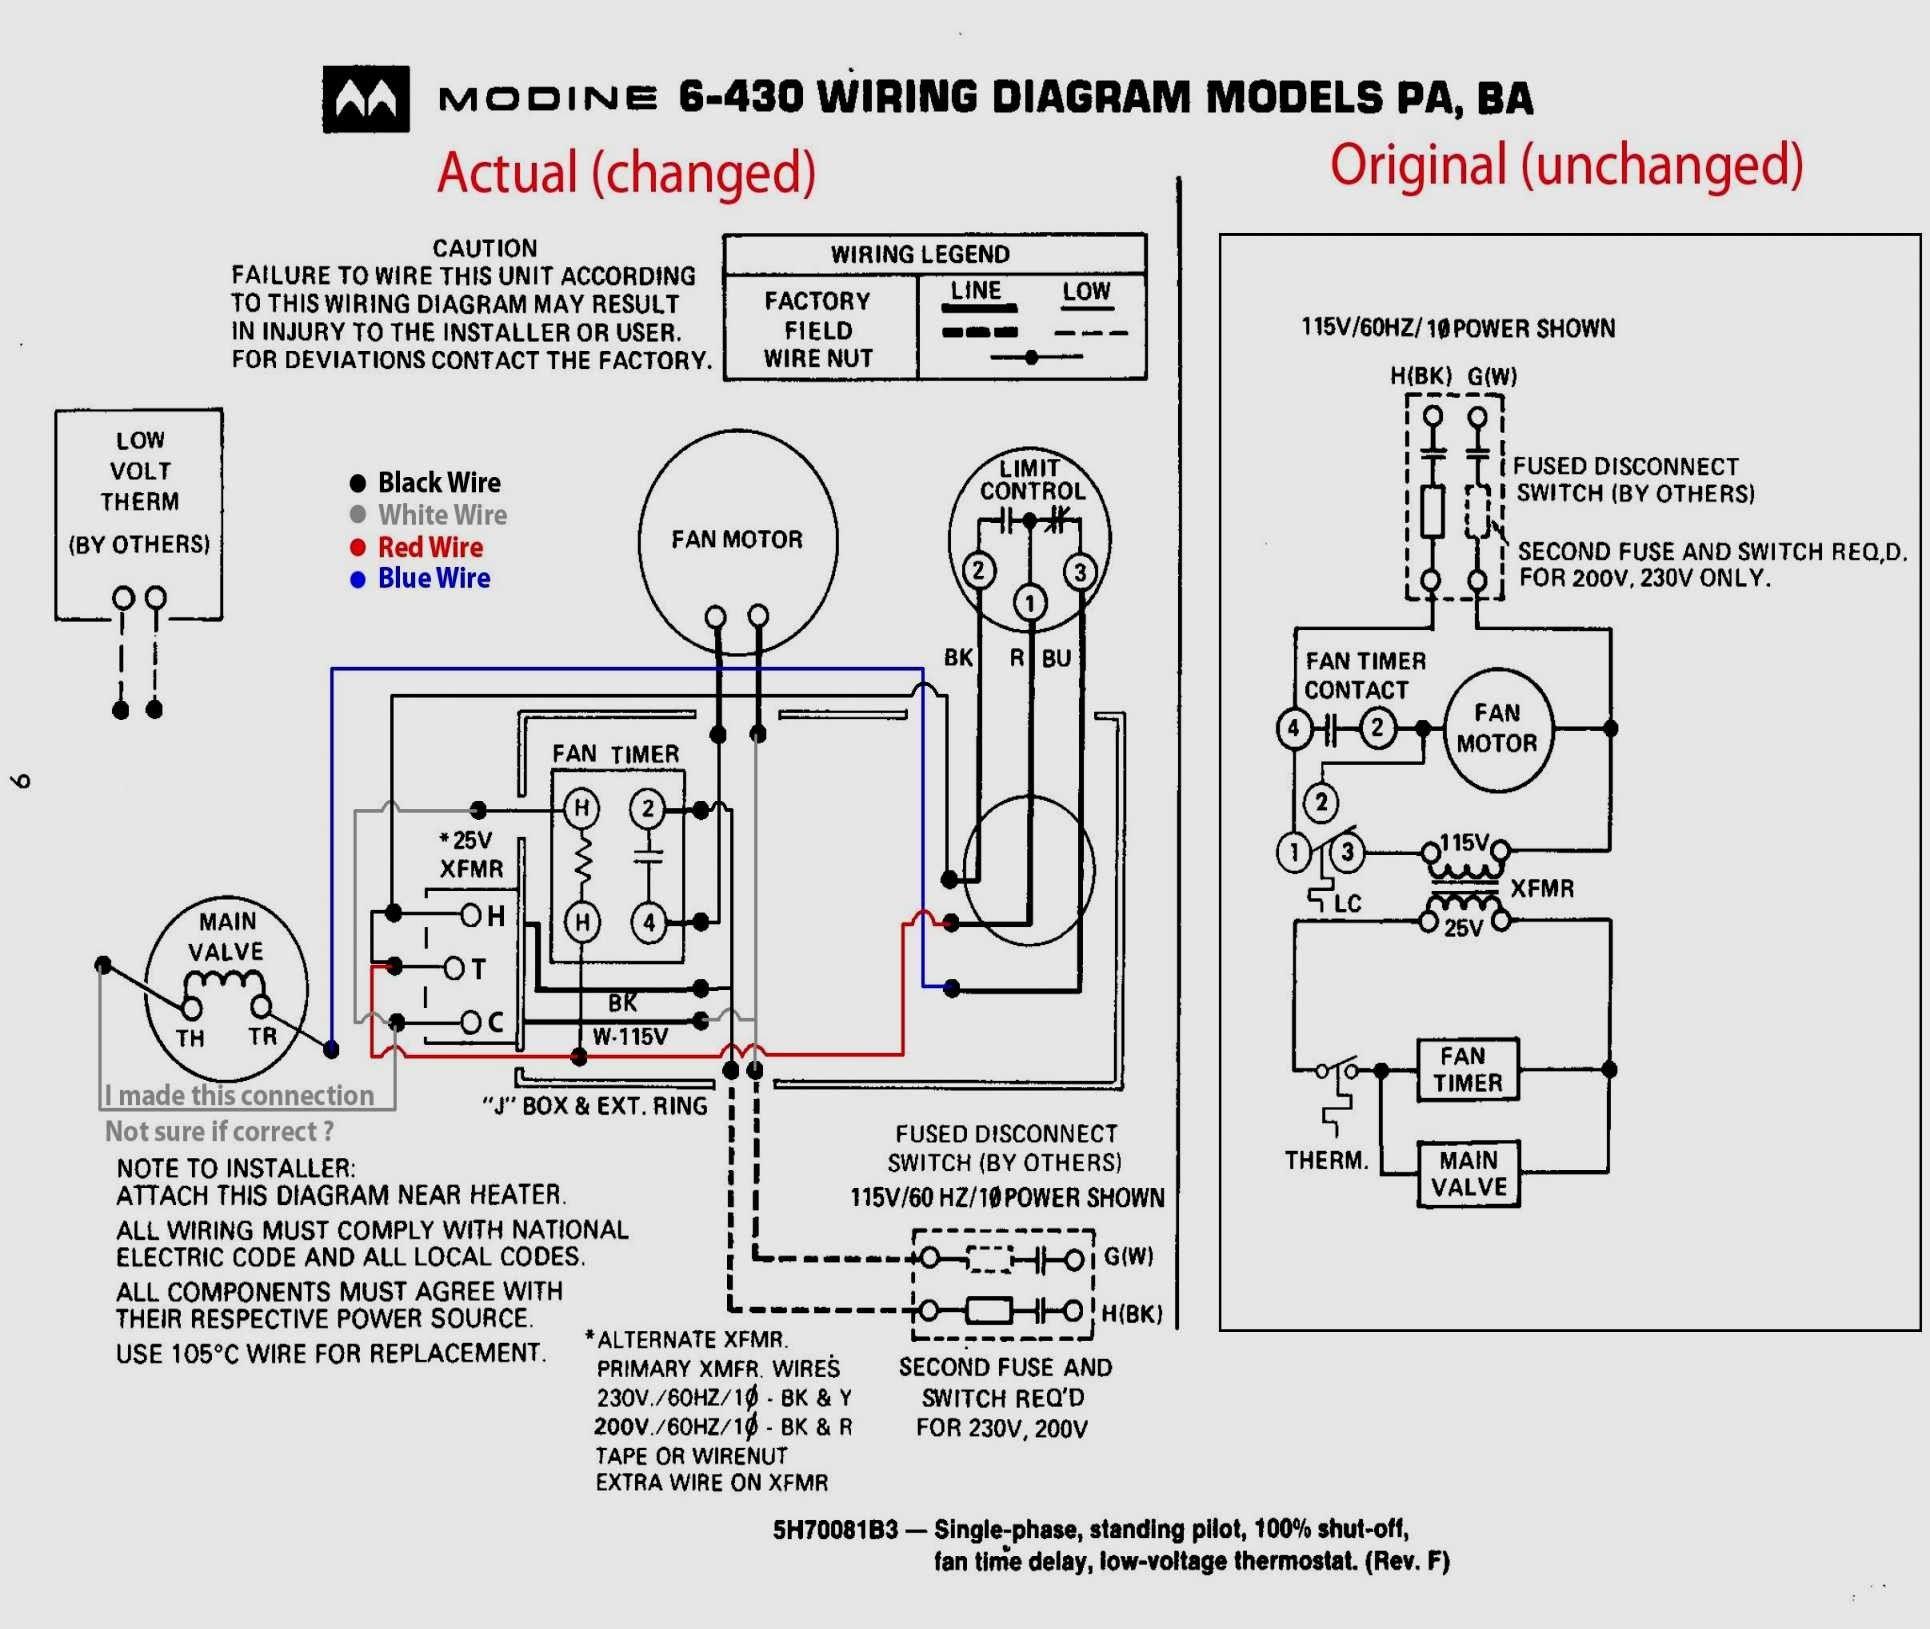 intertherm thermostat wiring diagram